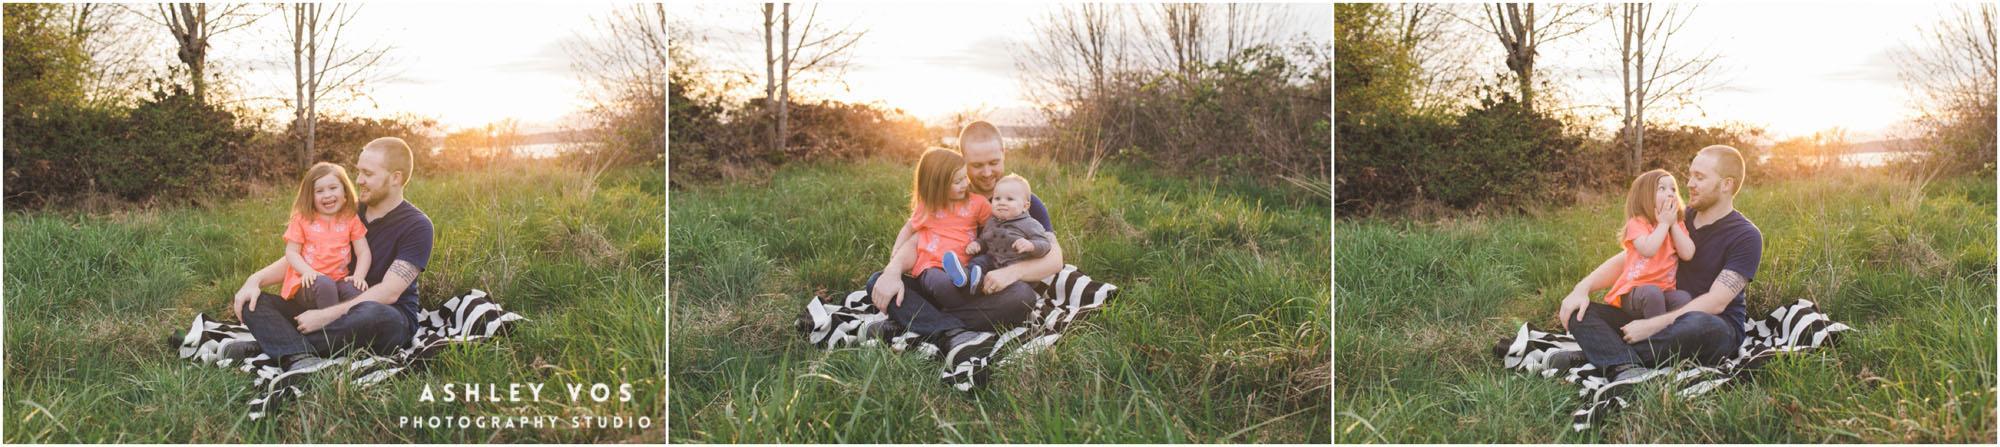 seattle tacoma family photography_0039.jpg